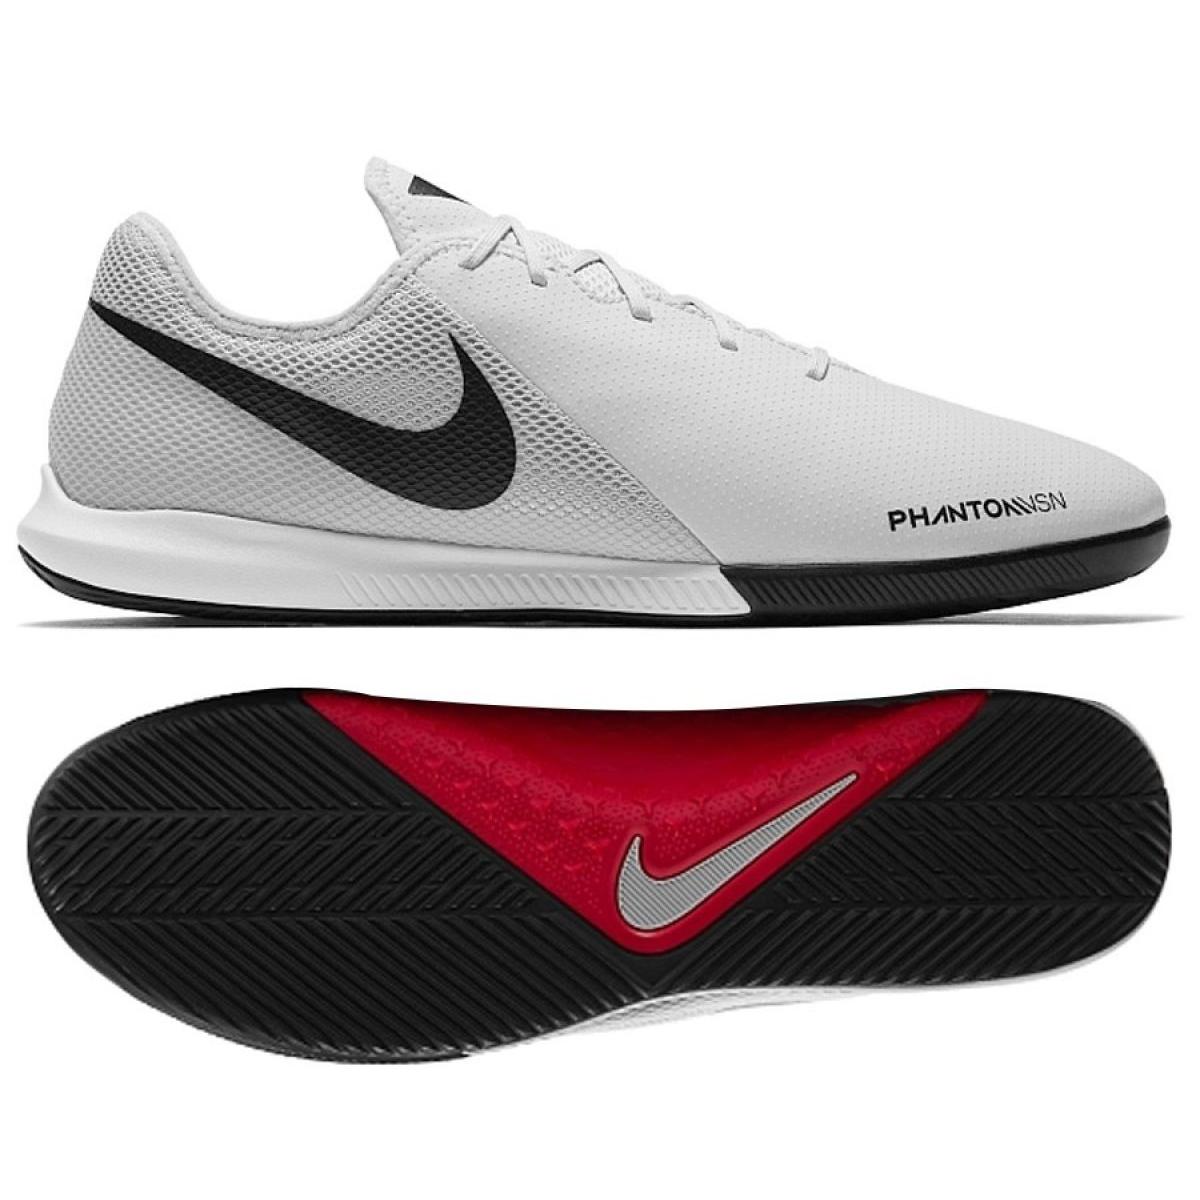 Hábil Se asemeja compañerismo  Nike Phantom Vision Club DF Junior Astro Turf Trainers Sports Direct